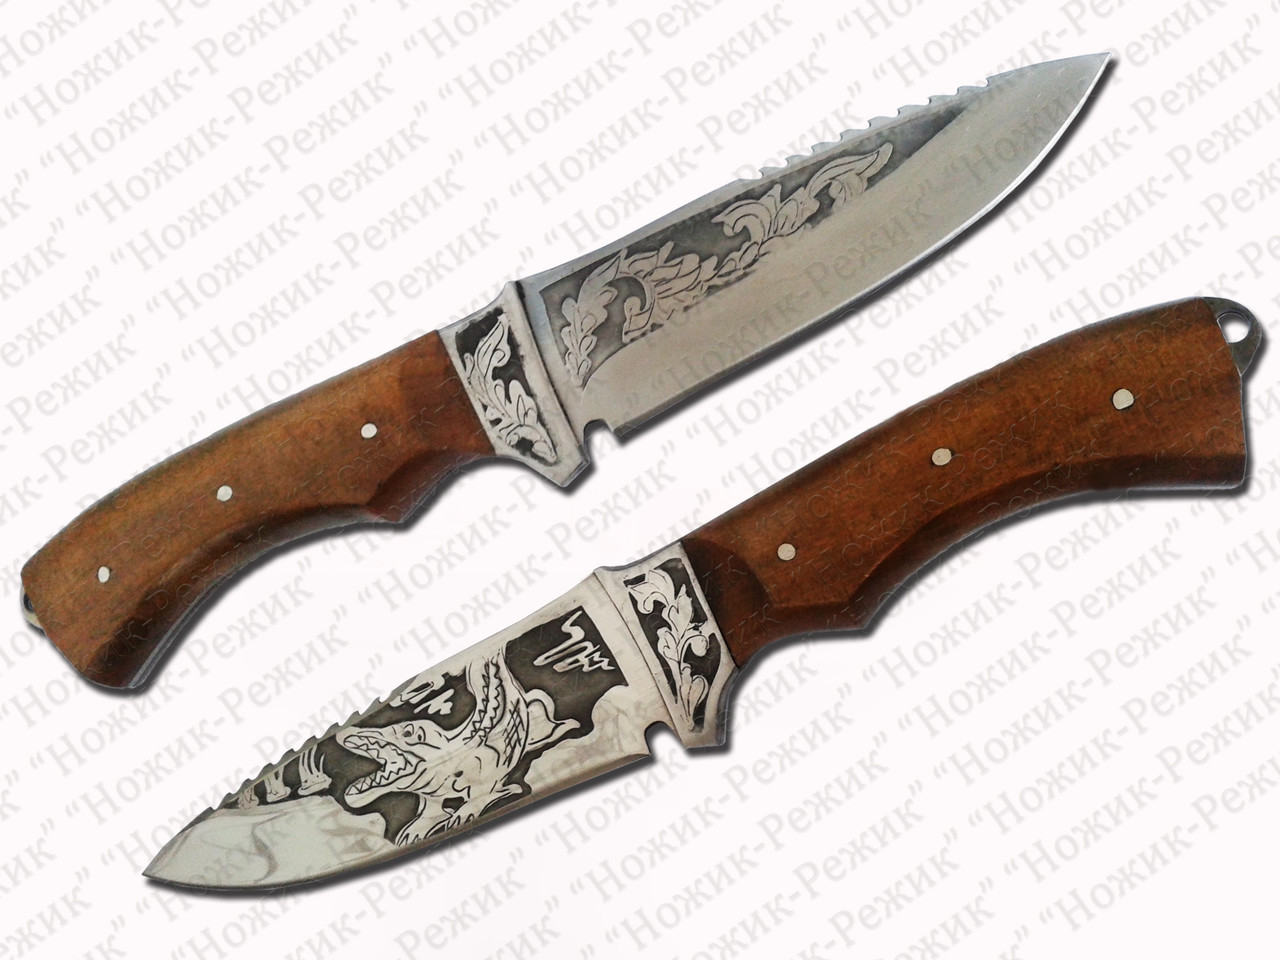 Туристический нож, охотничий нож, рыбацкий нож, нож боевой, нож для кемпинга